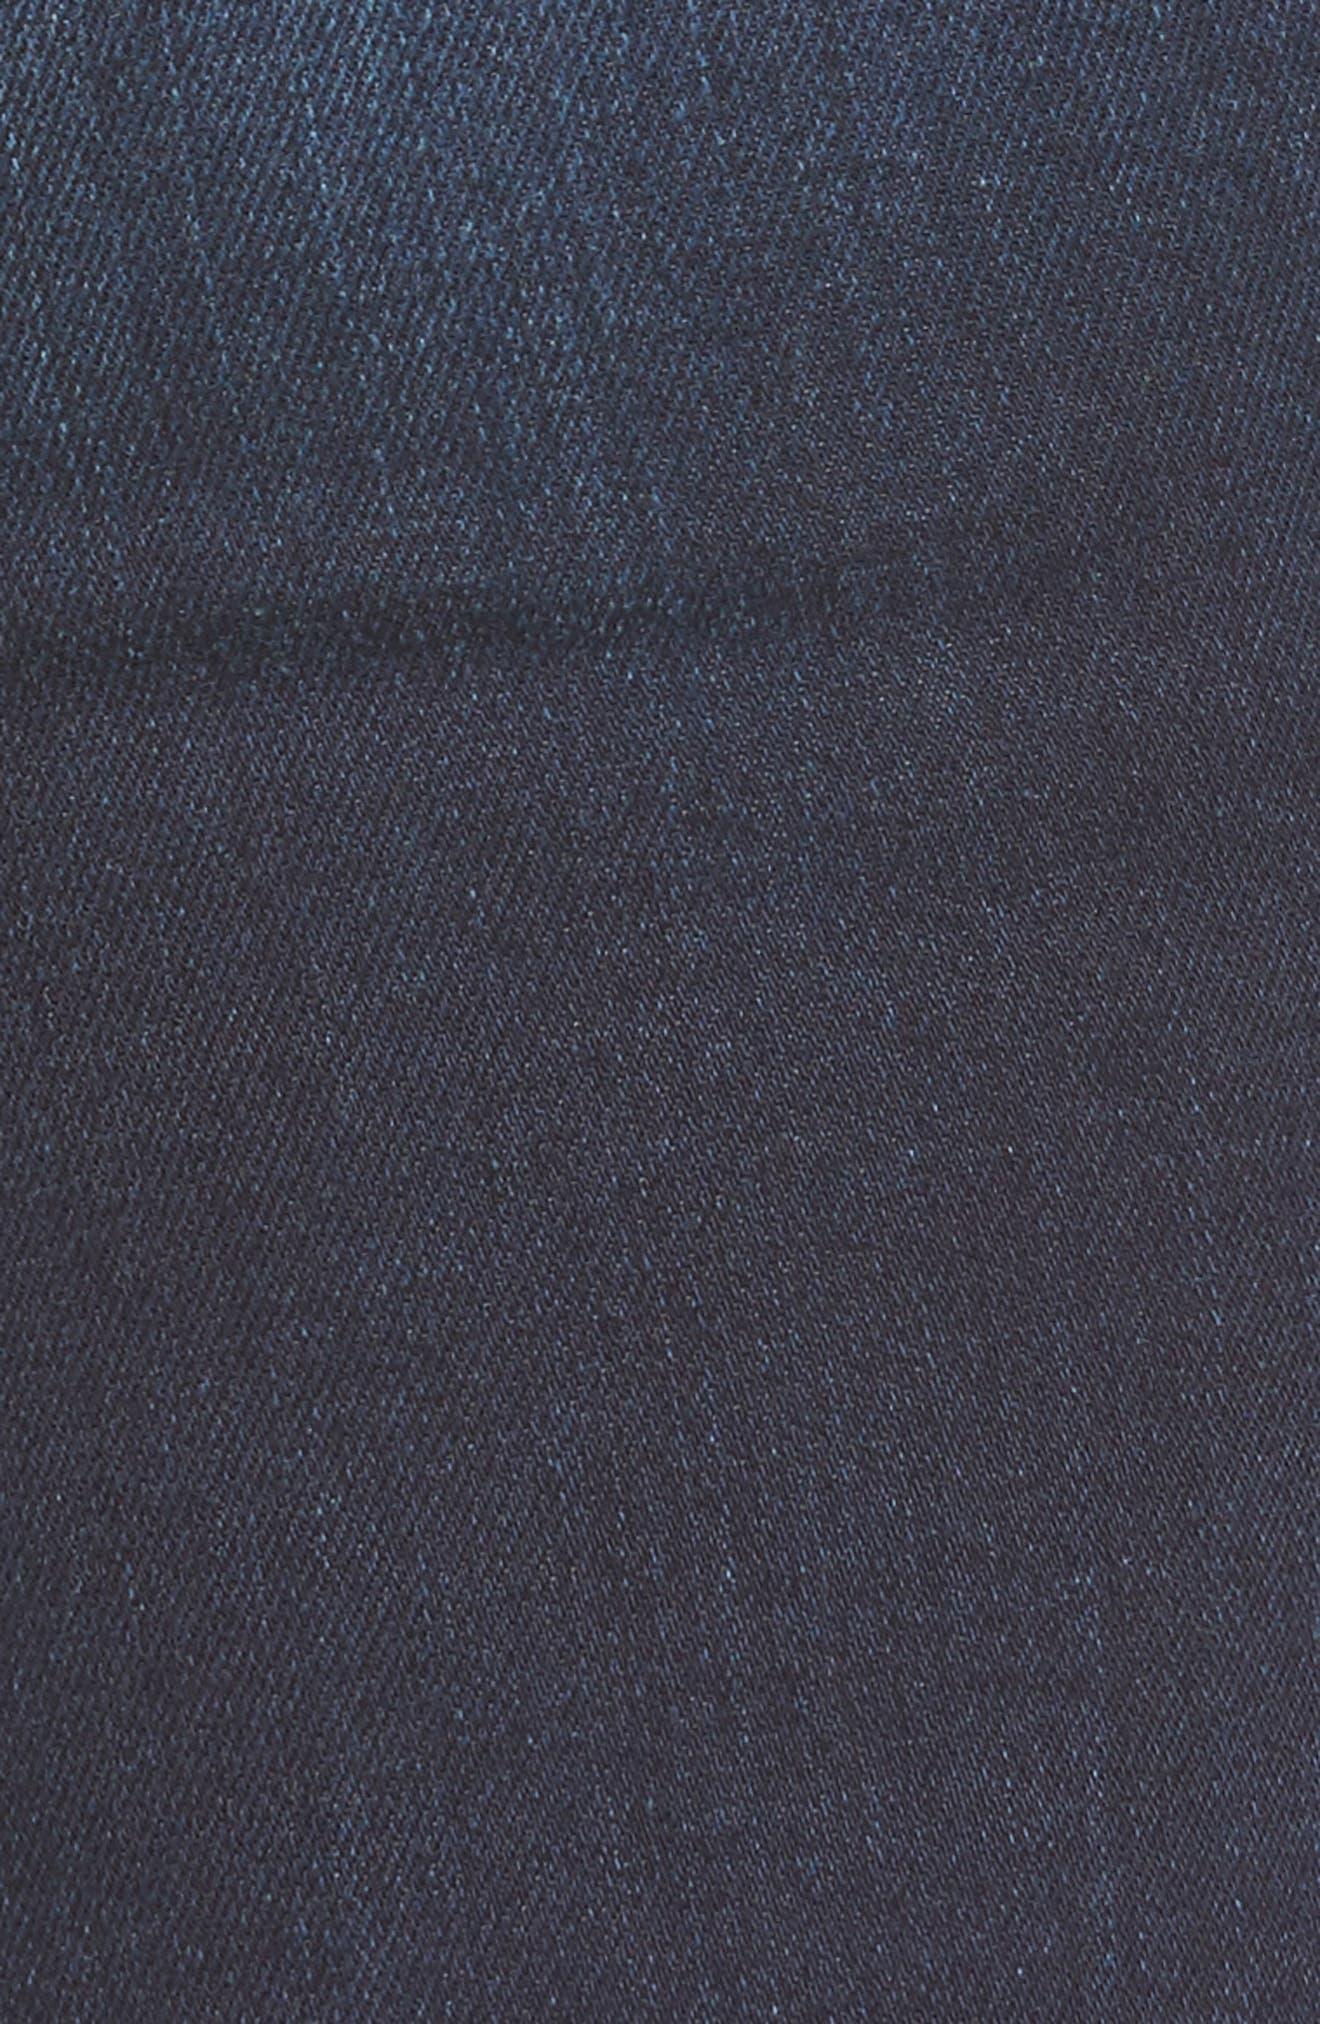 Alternate Image 5  - KUT from the Kloth Mia High Waist Skinny Jeans (Regular & Petite) (Pacable)